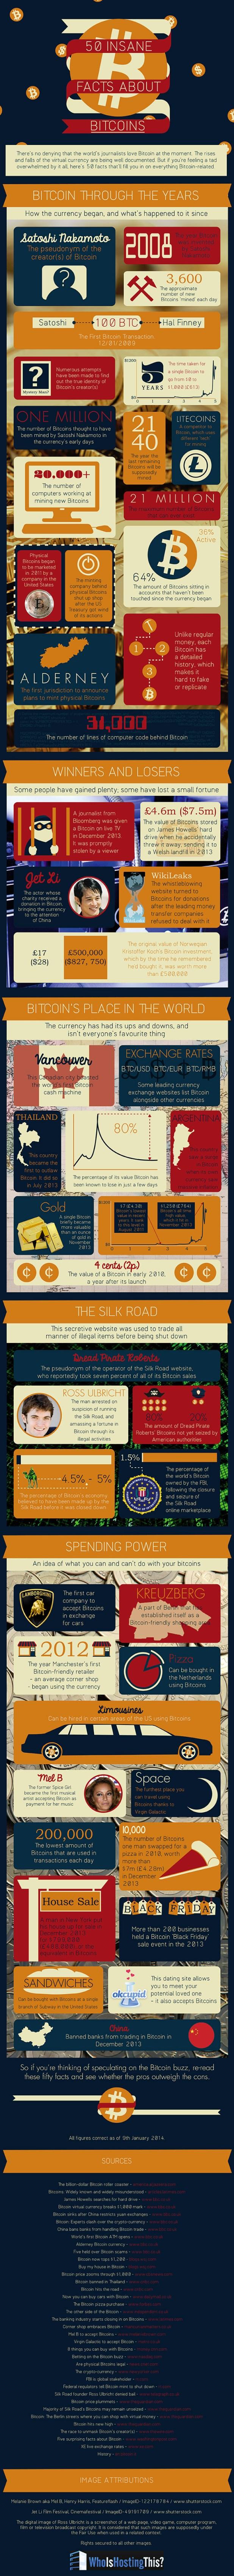 50 Interesting Bitcoin Facts